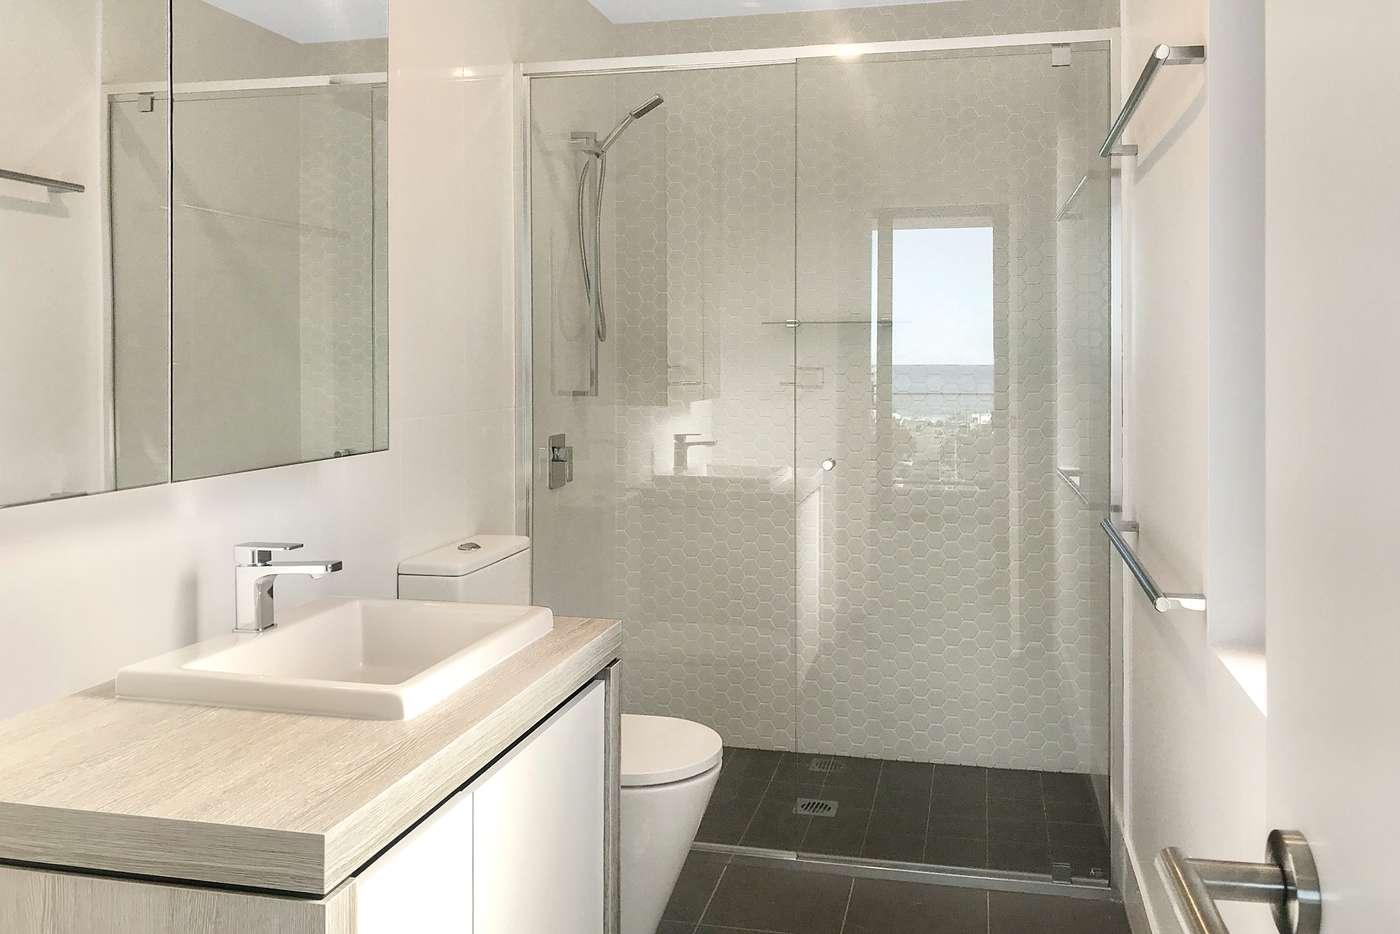 Seventh view of Homely apartment listing, 55/1 Bondi Avenue, Mermaid Beach QLD 4218